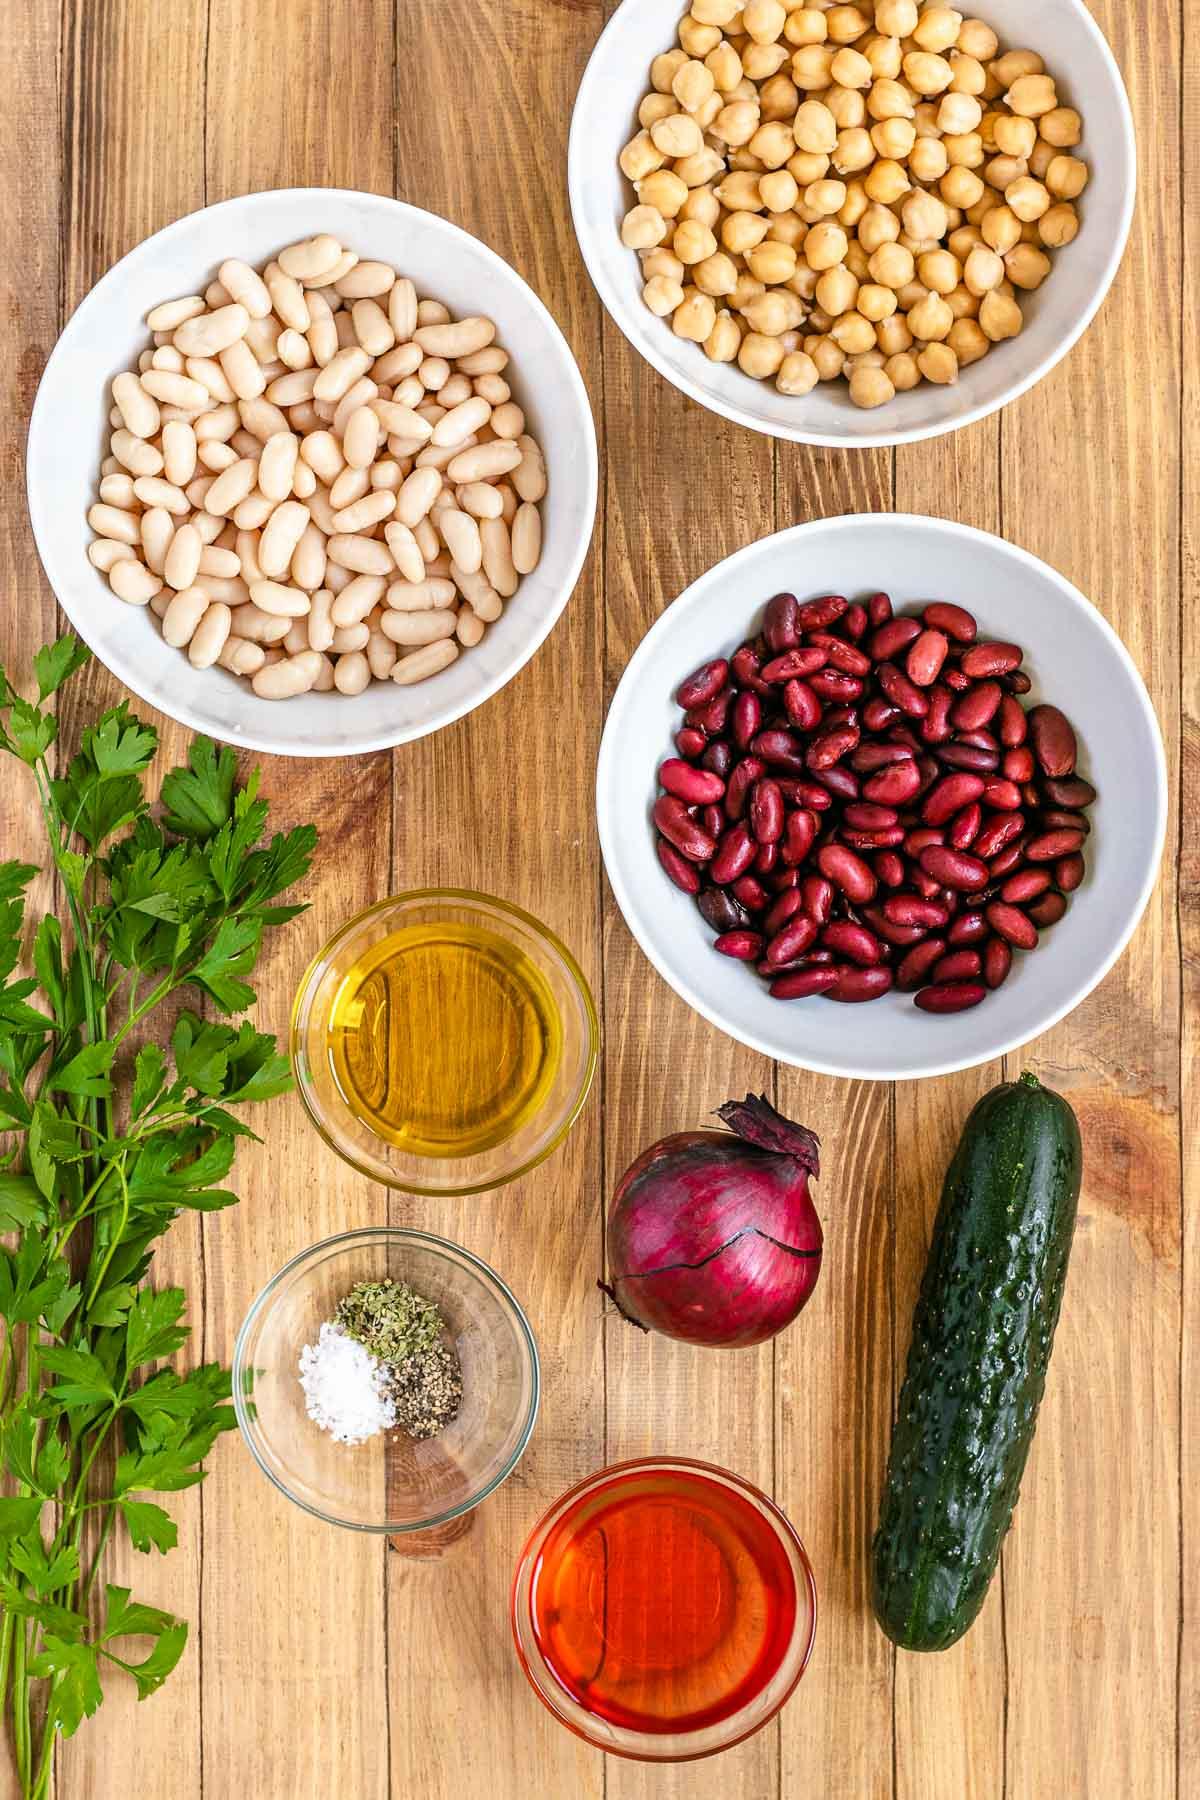 Three Bean Salad ingredients in bowls